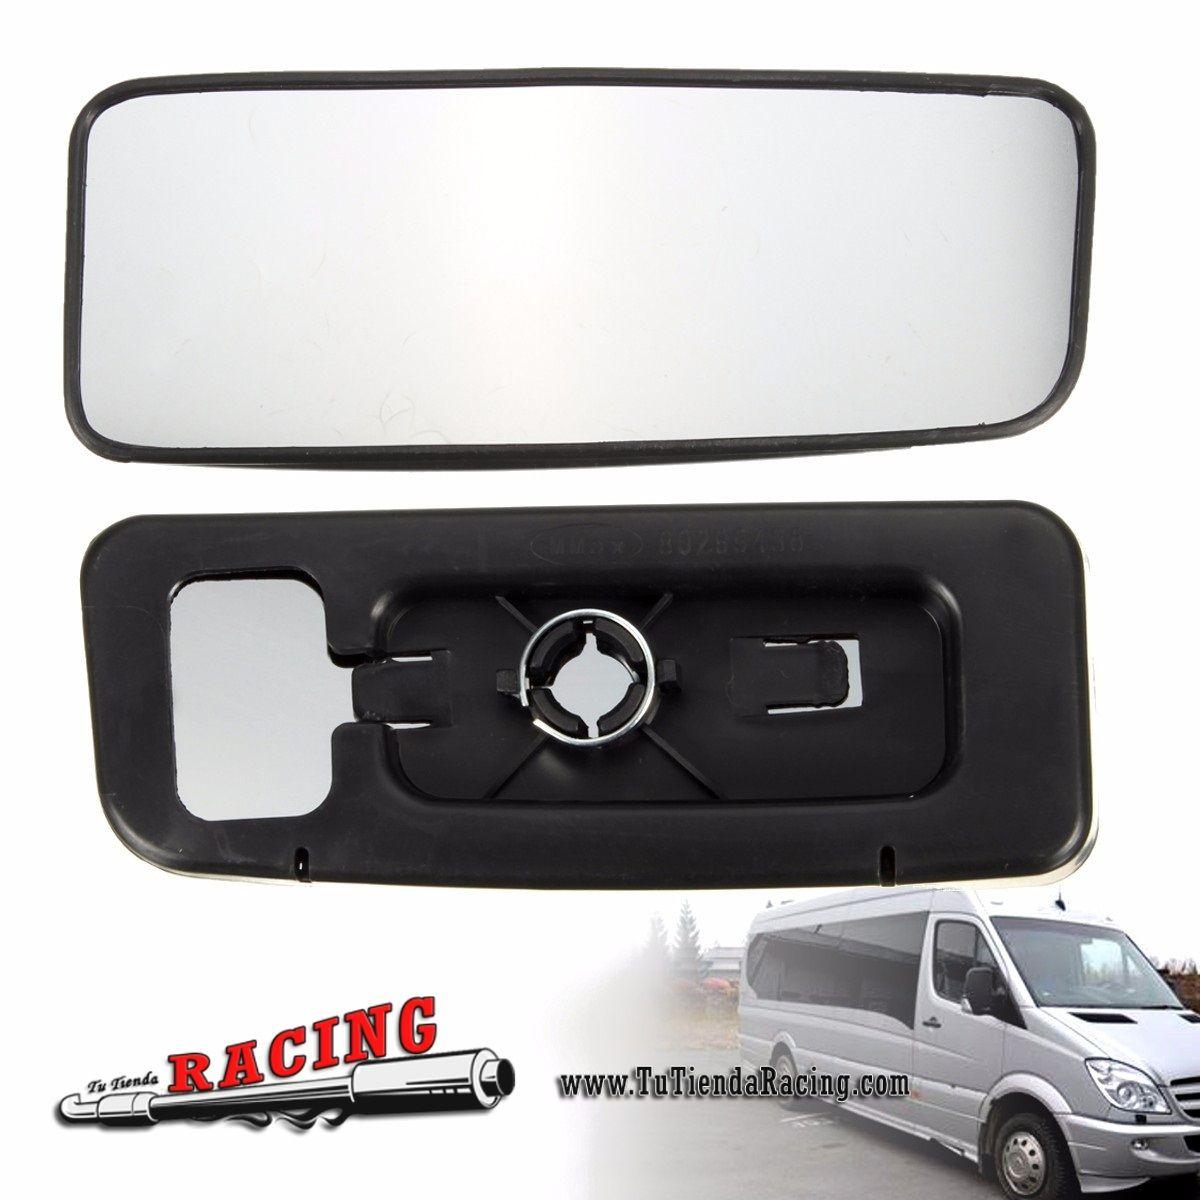 18 16 env o siempre gratuito cristal interior de espejo retrovisor derecho para mercedes - Espejo retrovisor mercedes sprinter ...